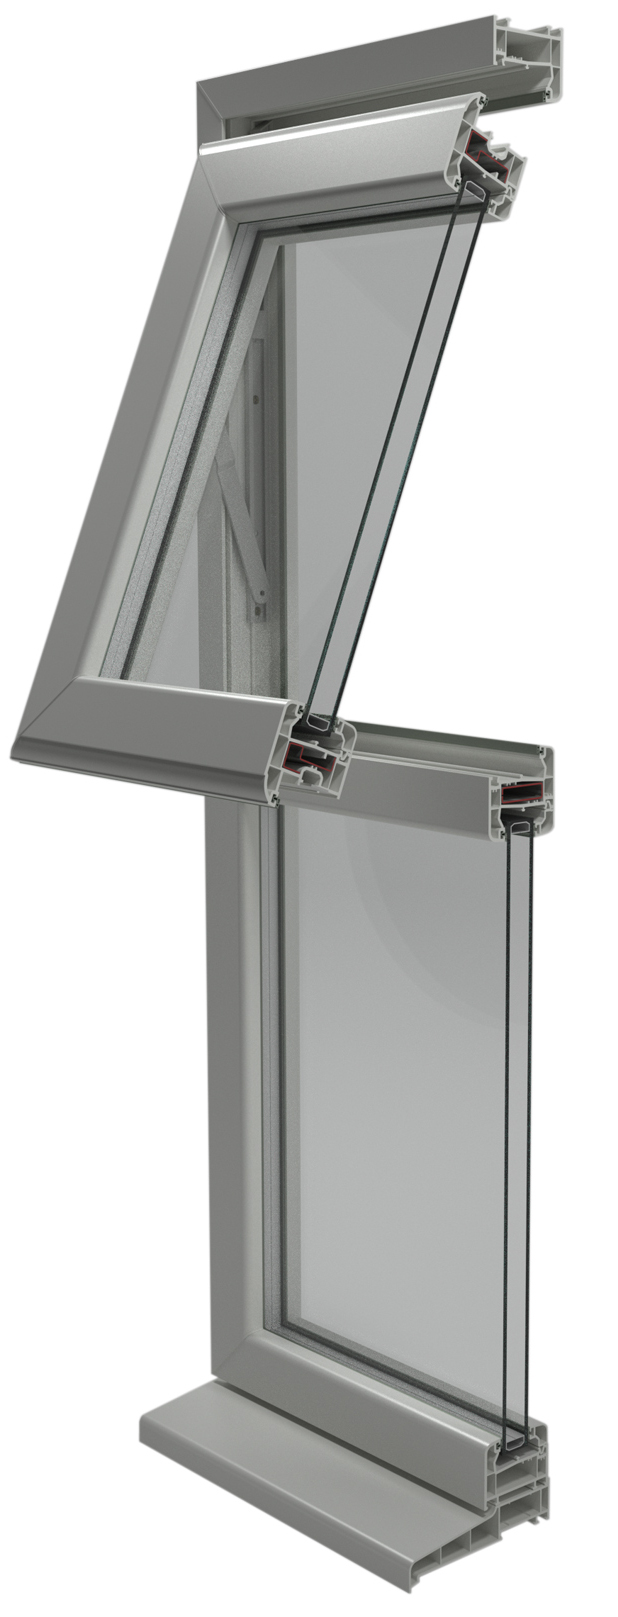 Sección de ventana proyectante con antepecho fijo.